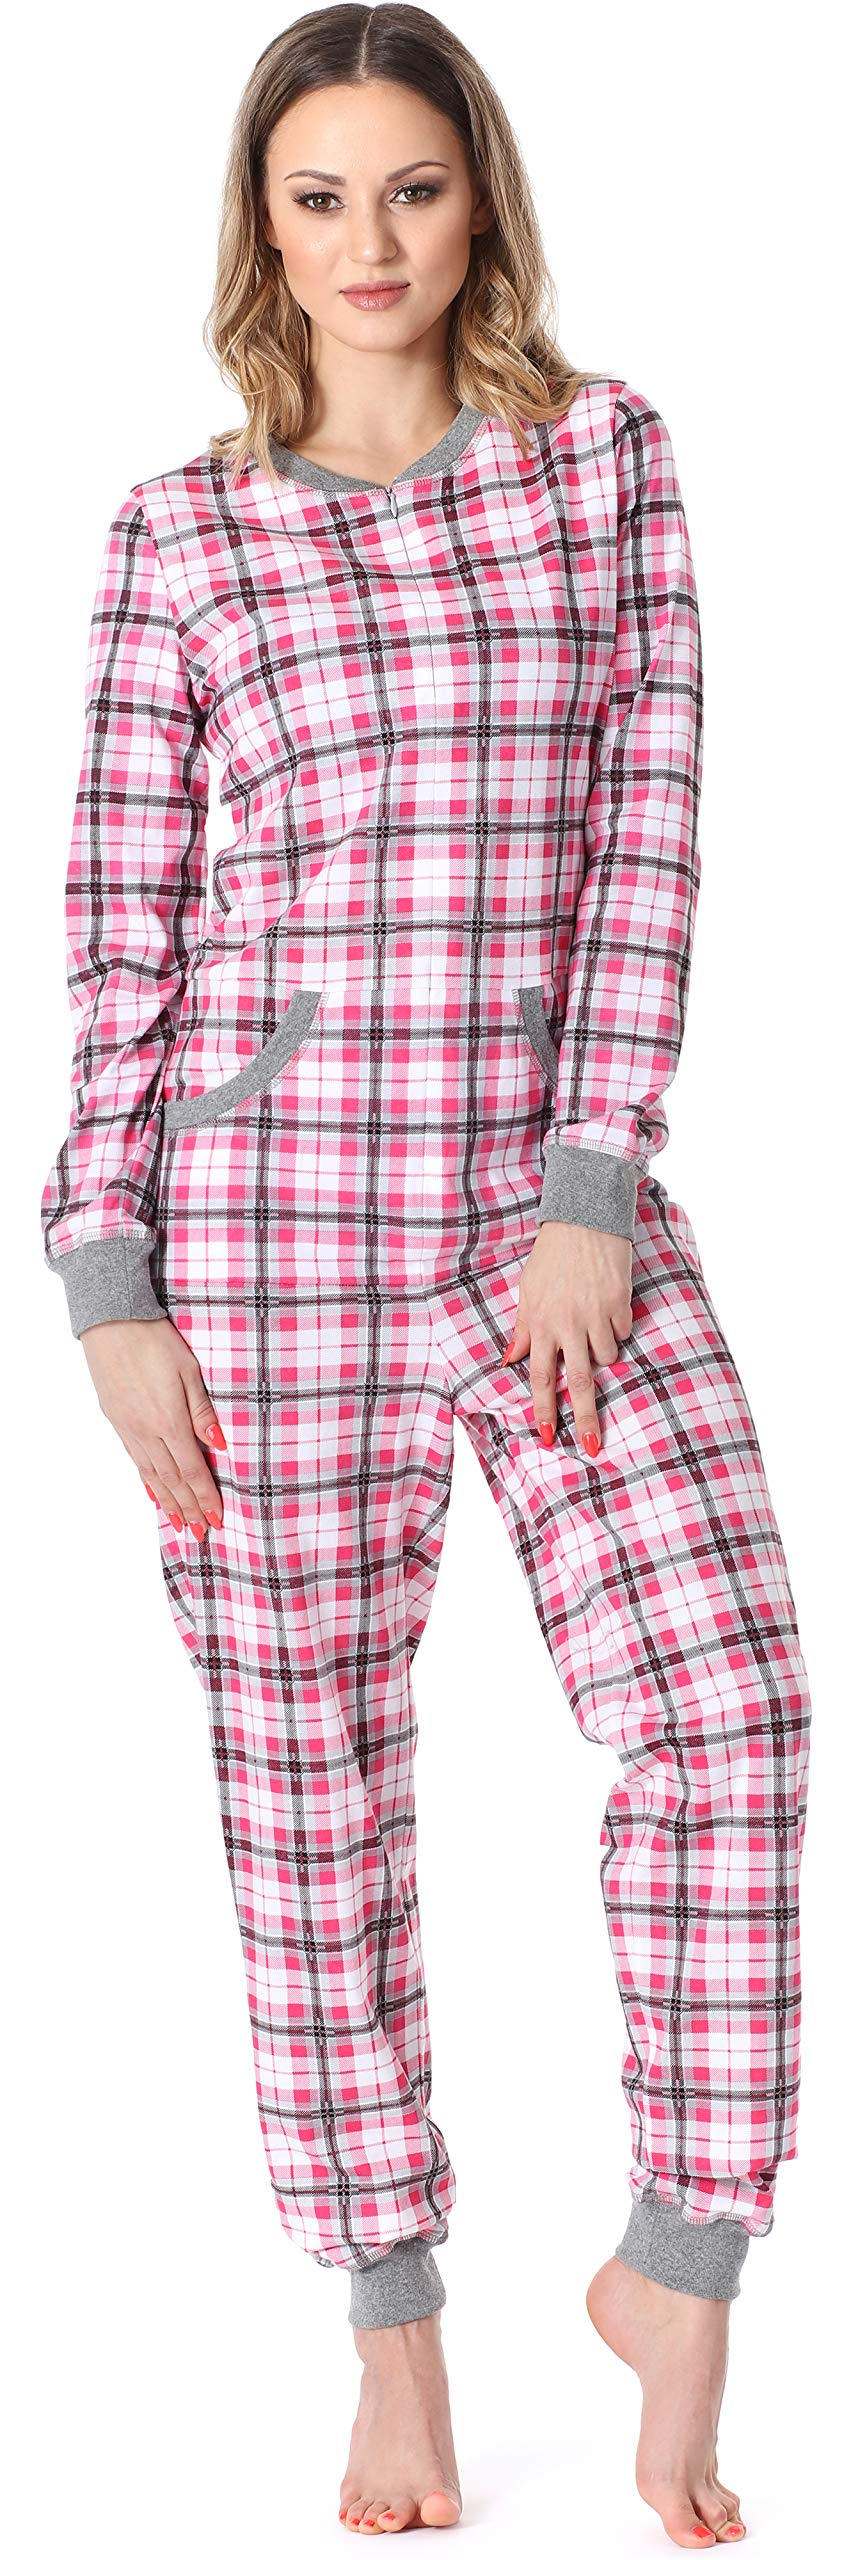 46b7d7ba824b Merry Style Pijama Entero Una Pieza Ropa de Cama Mujer MS10-175 product  image